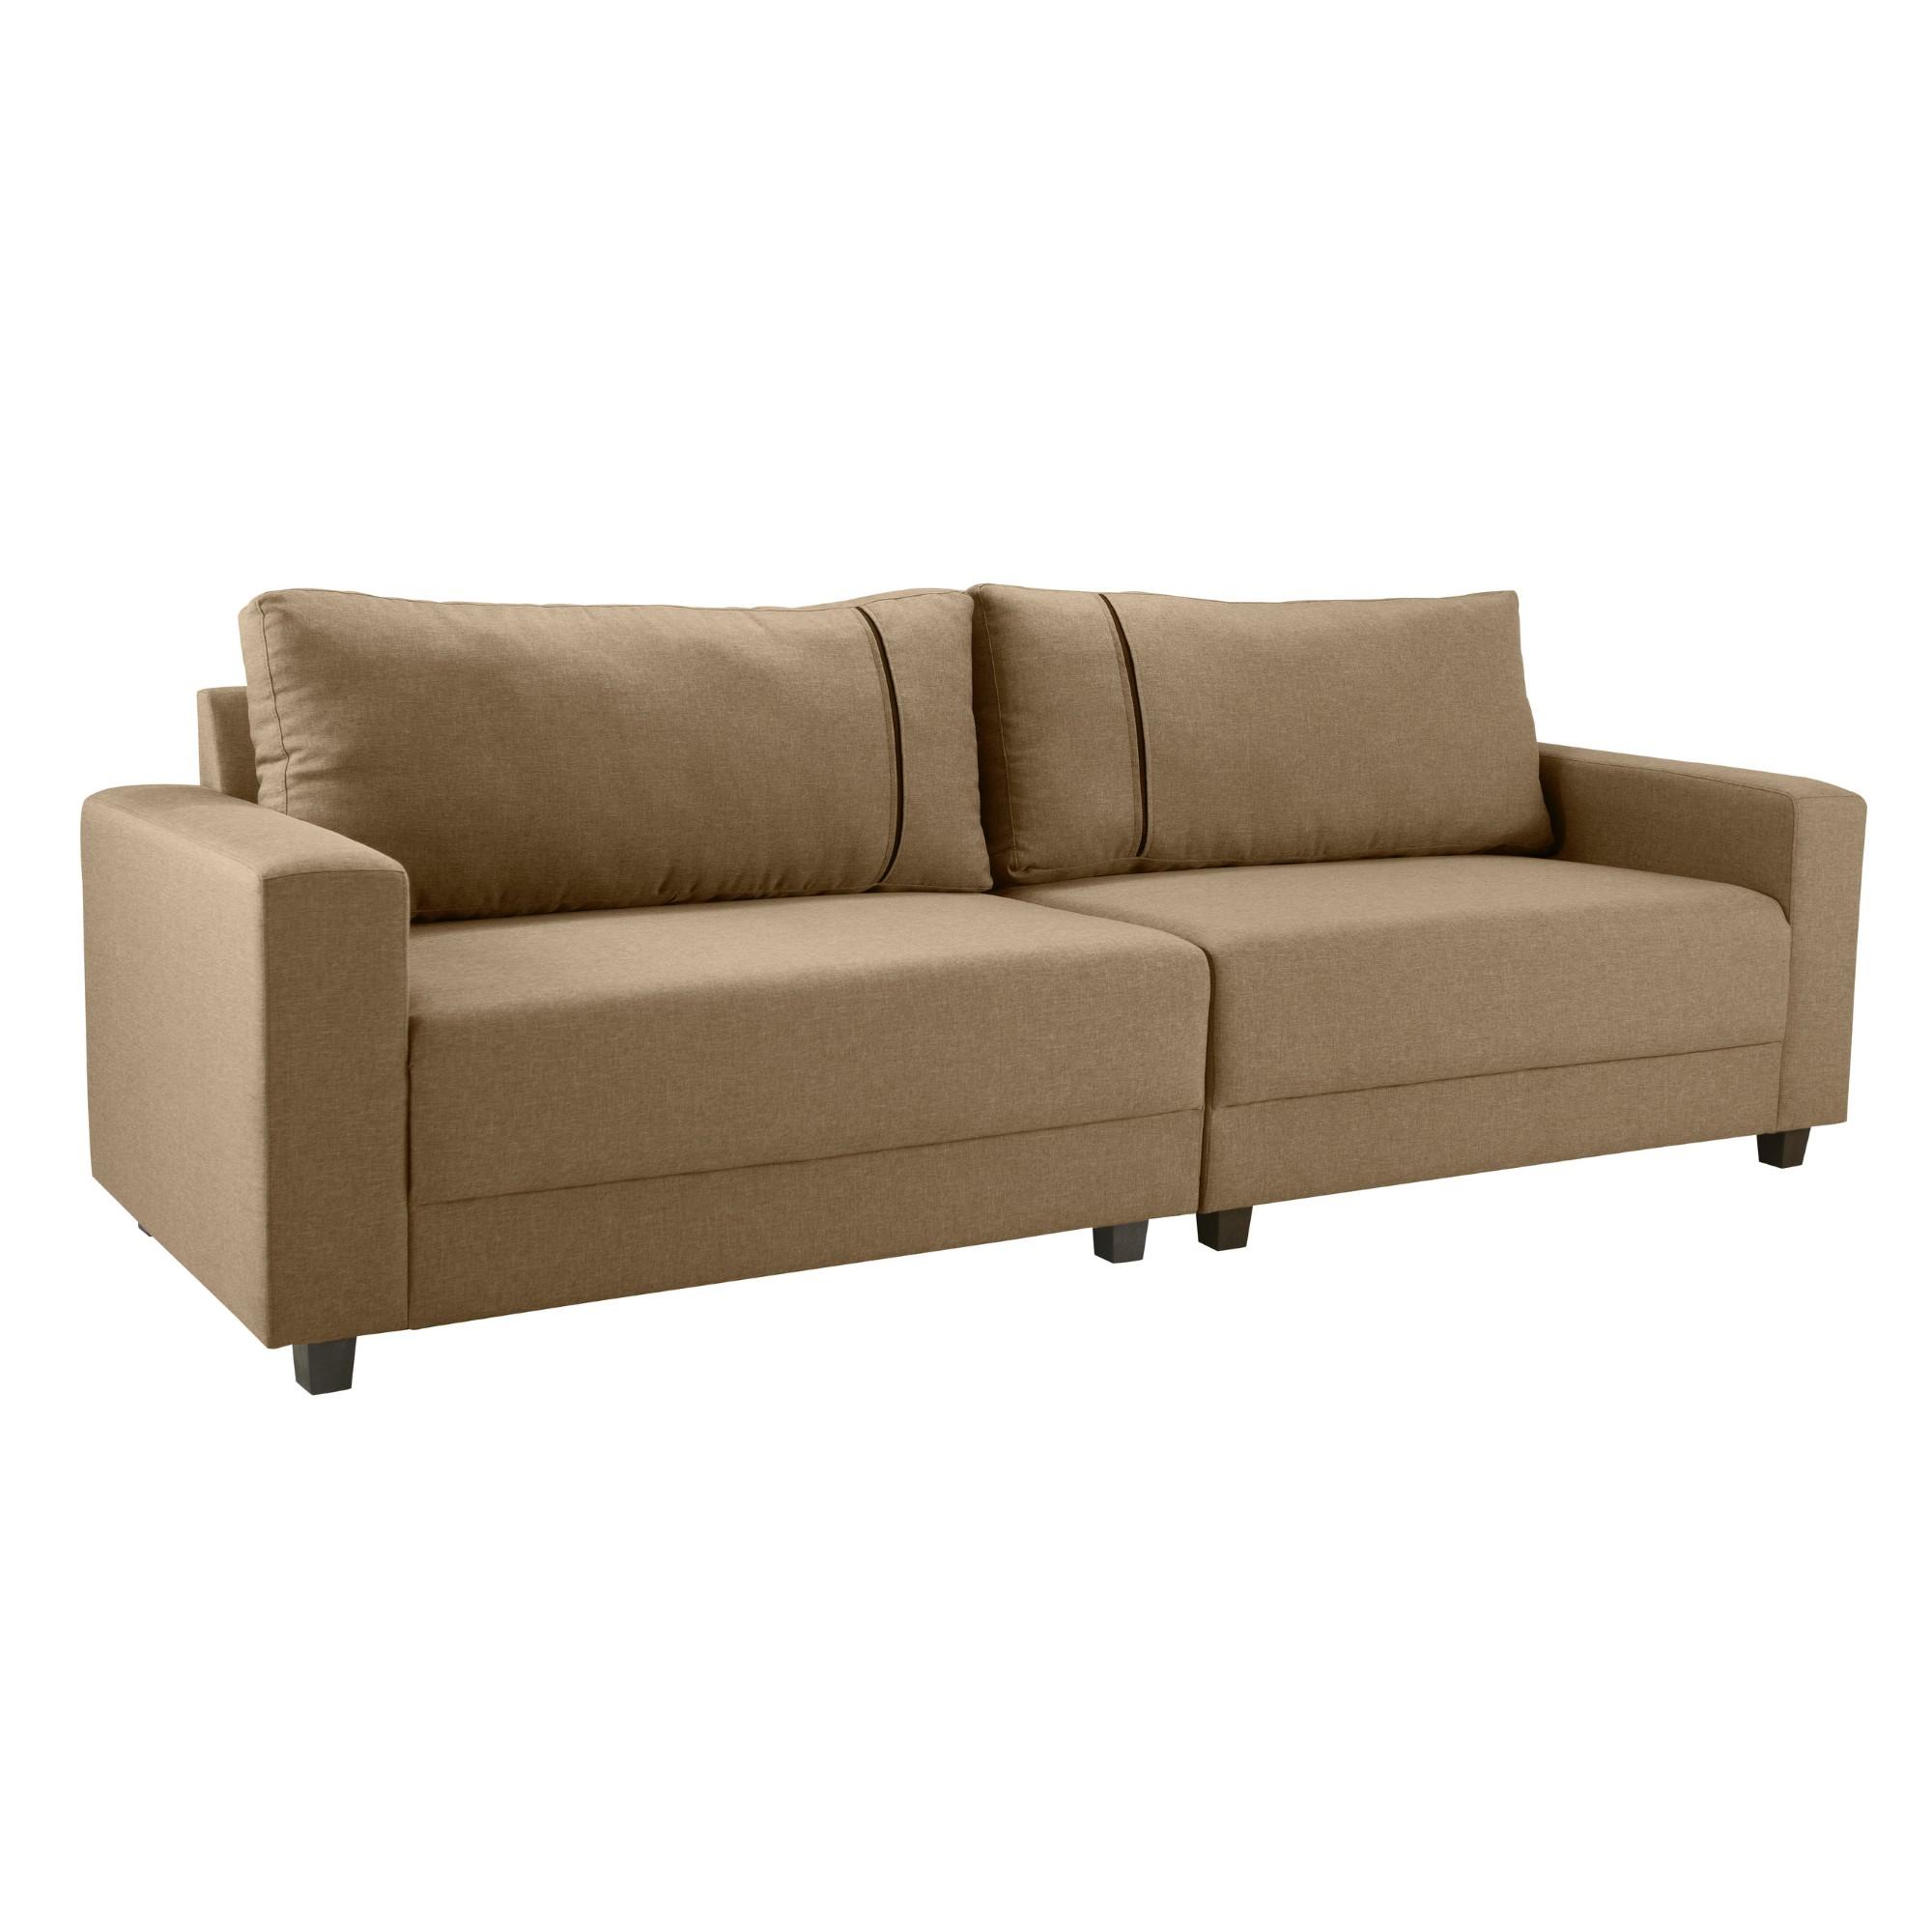 Sofa 4 Lugares Herval Compose Suede Marrom Claro